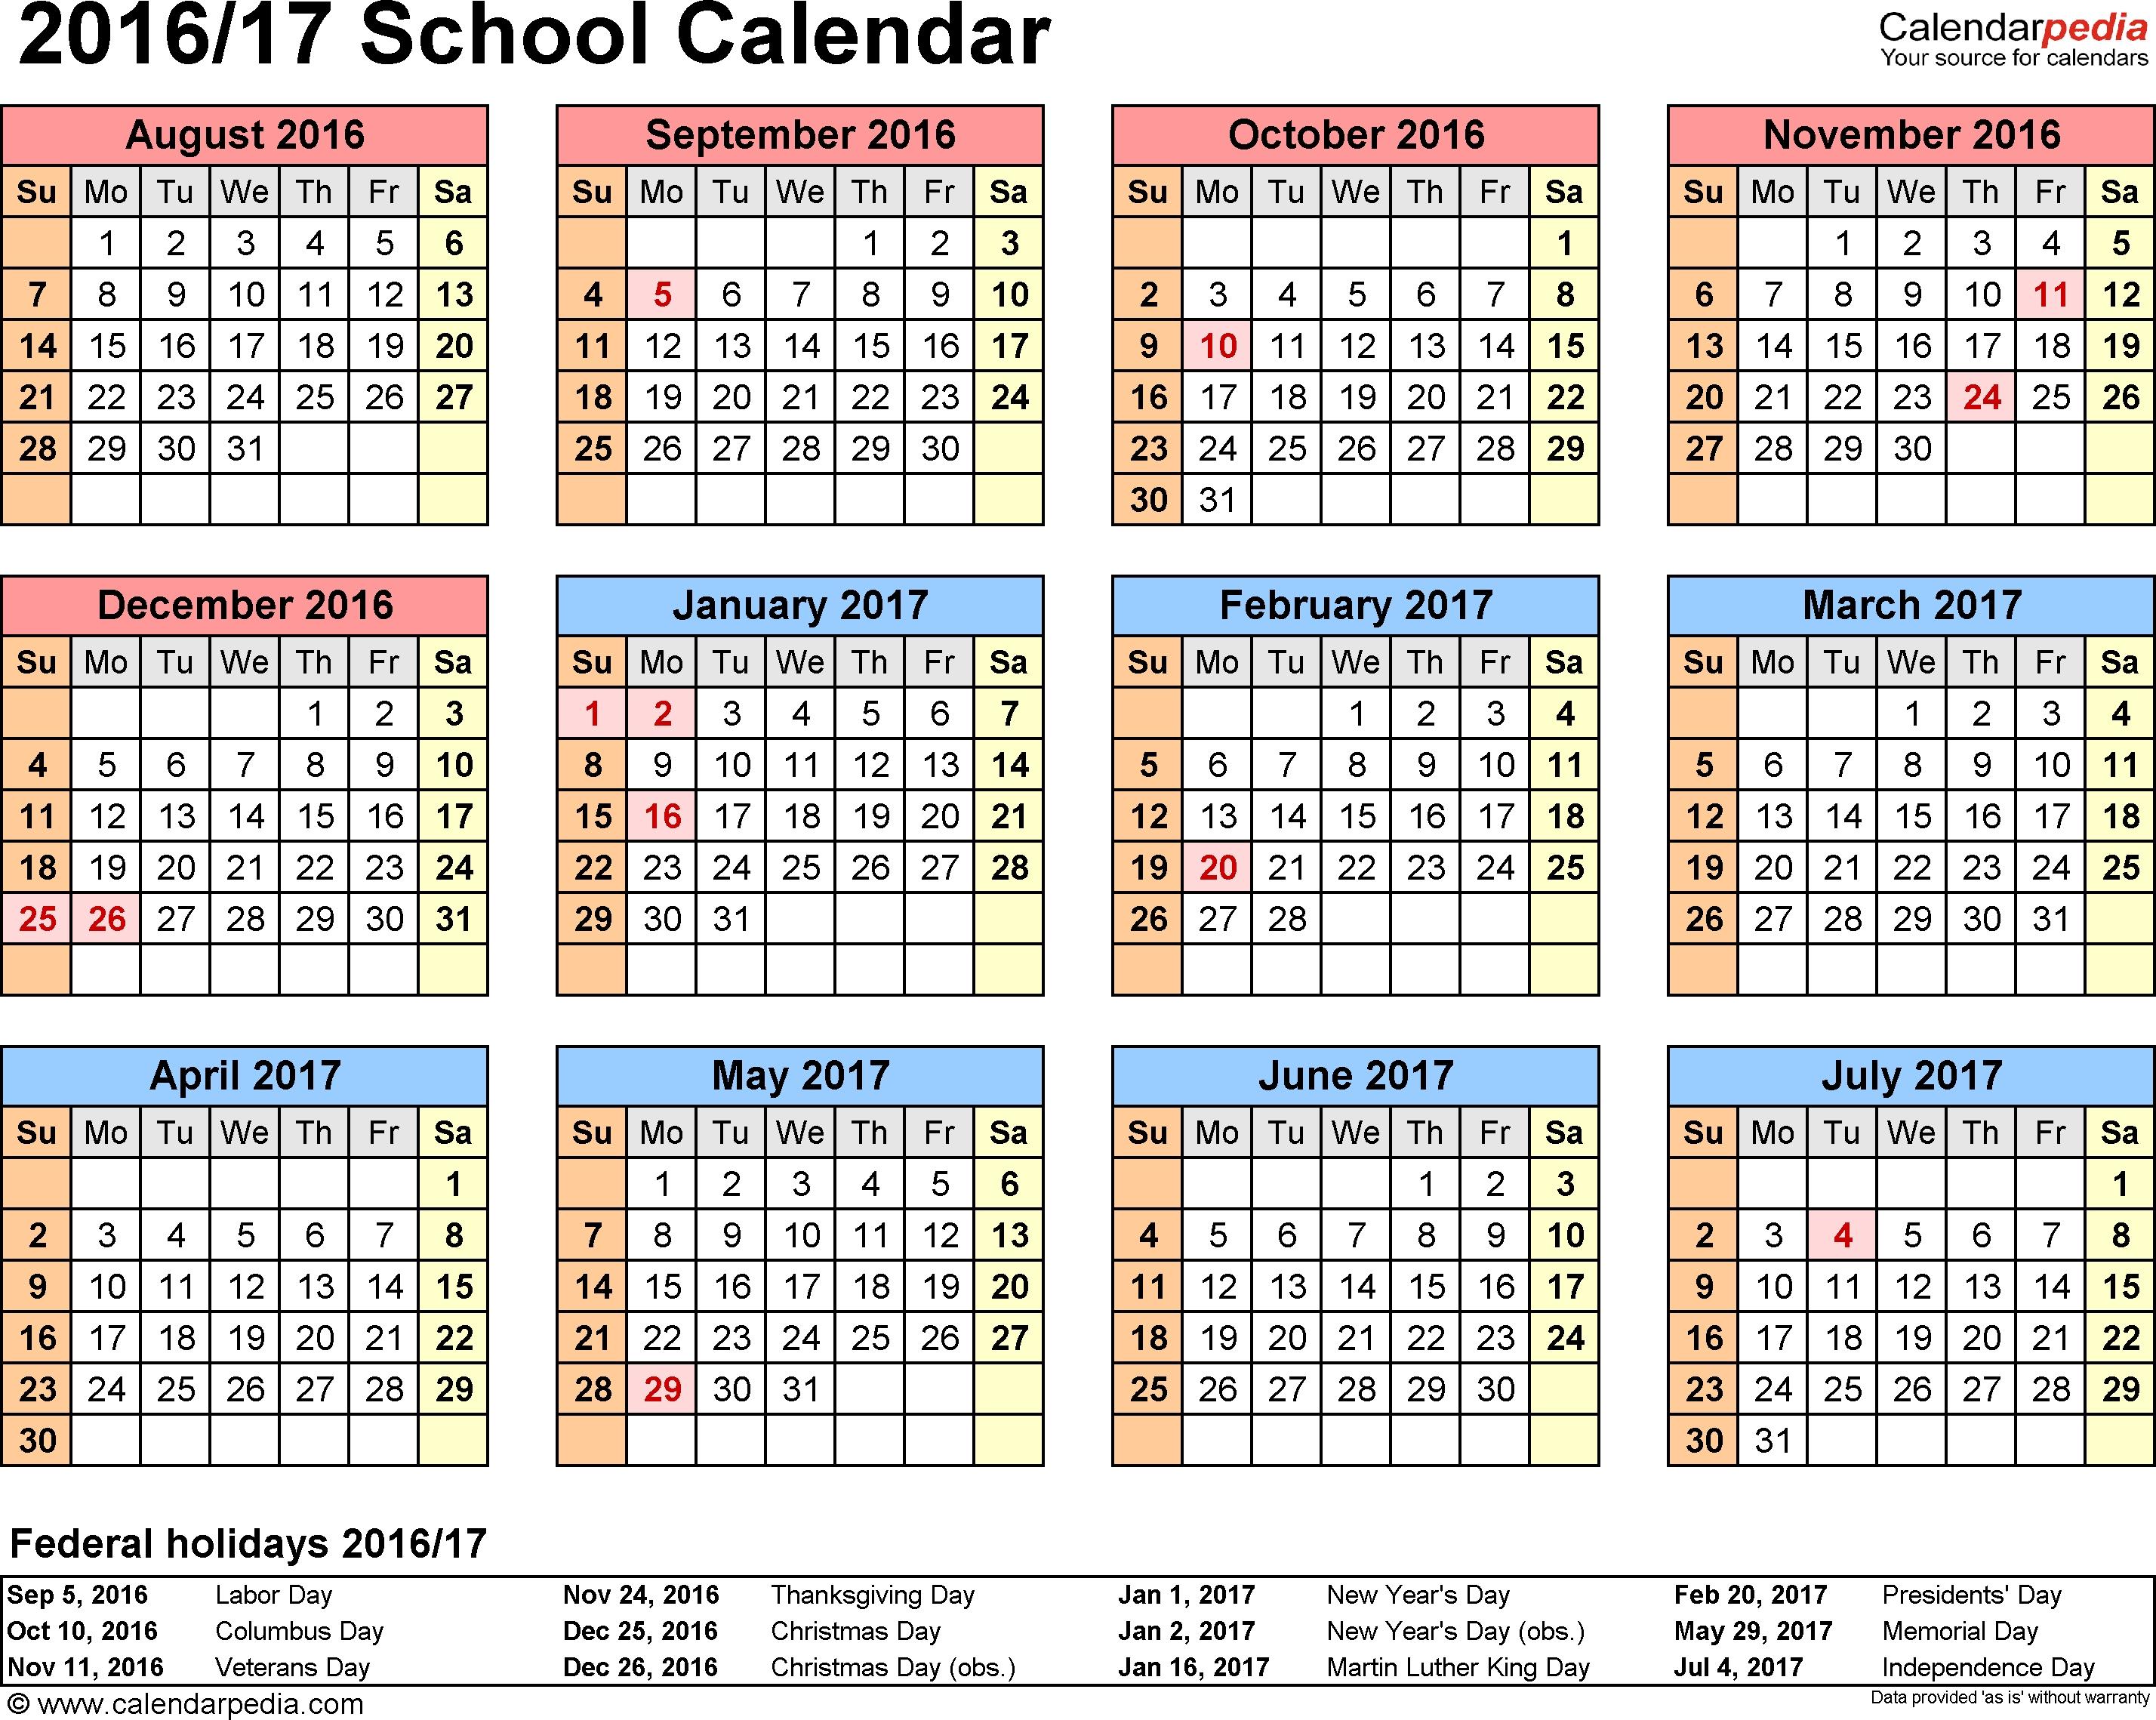 Free Printable Calendar 2020 17 | Month Calendar Printable With Boyertown School District Calendar 2020 17